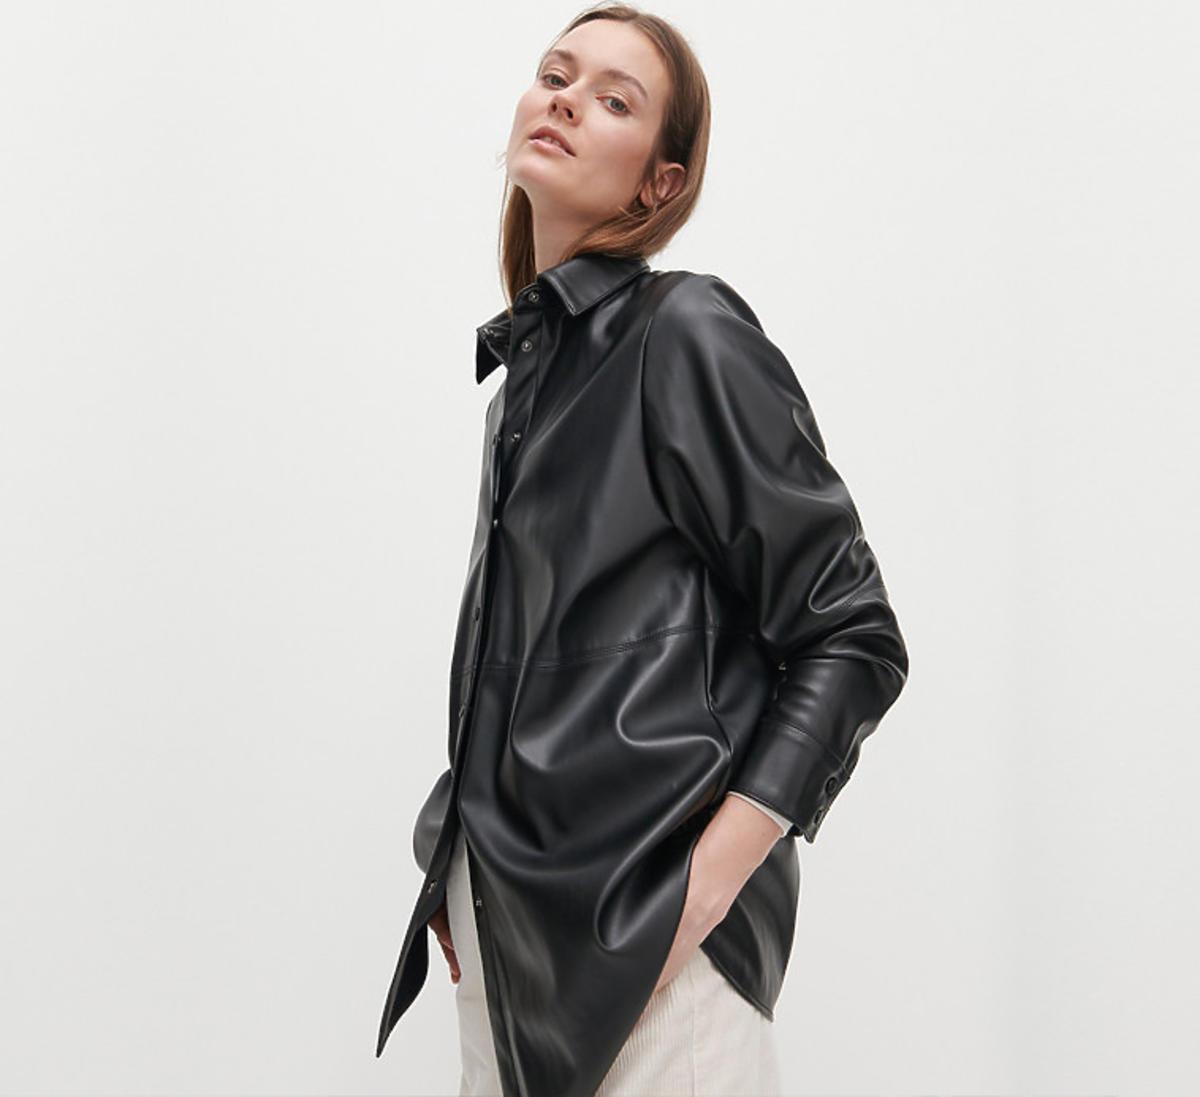 Skórzana czarna koszula Reserved, 79,99 zł